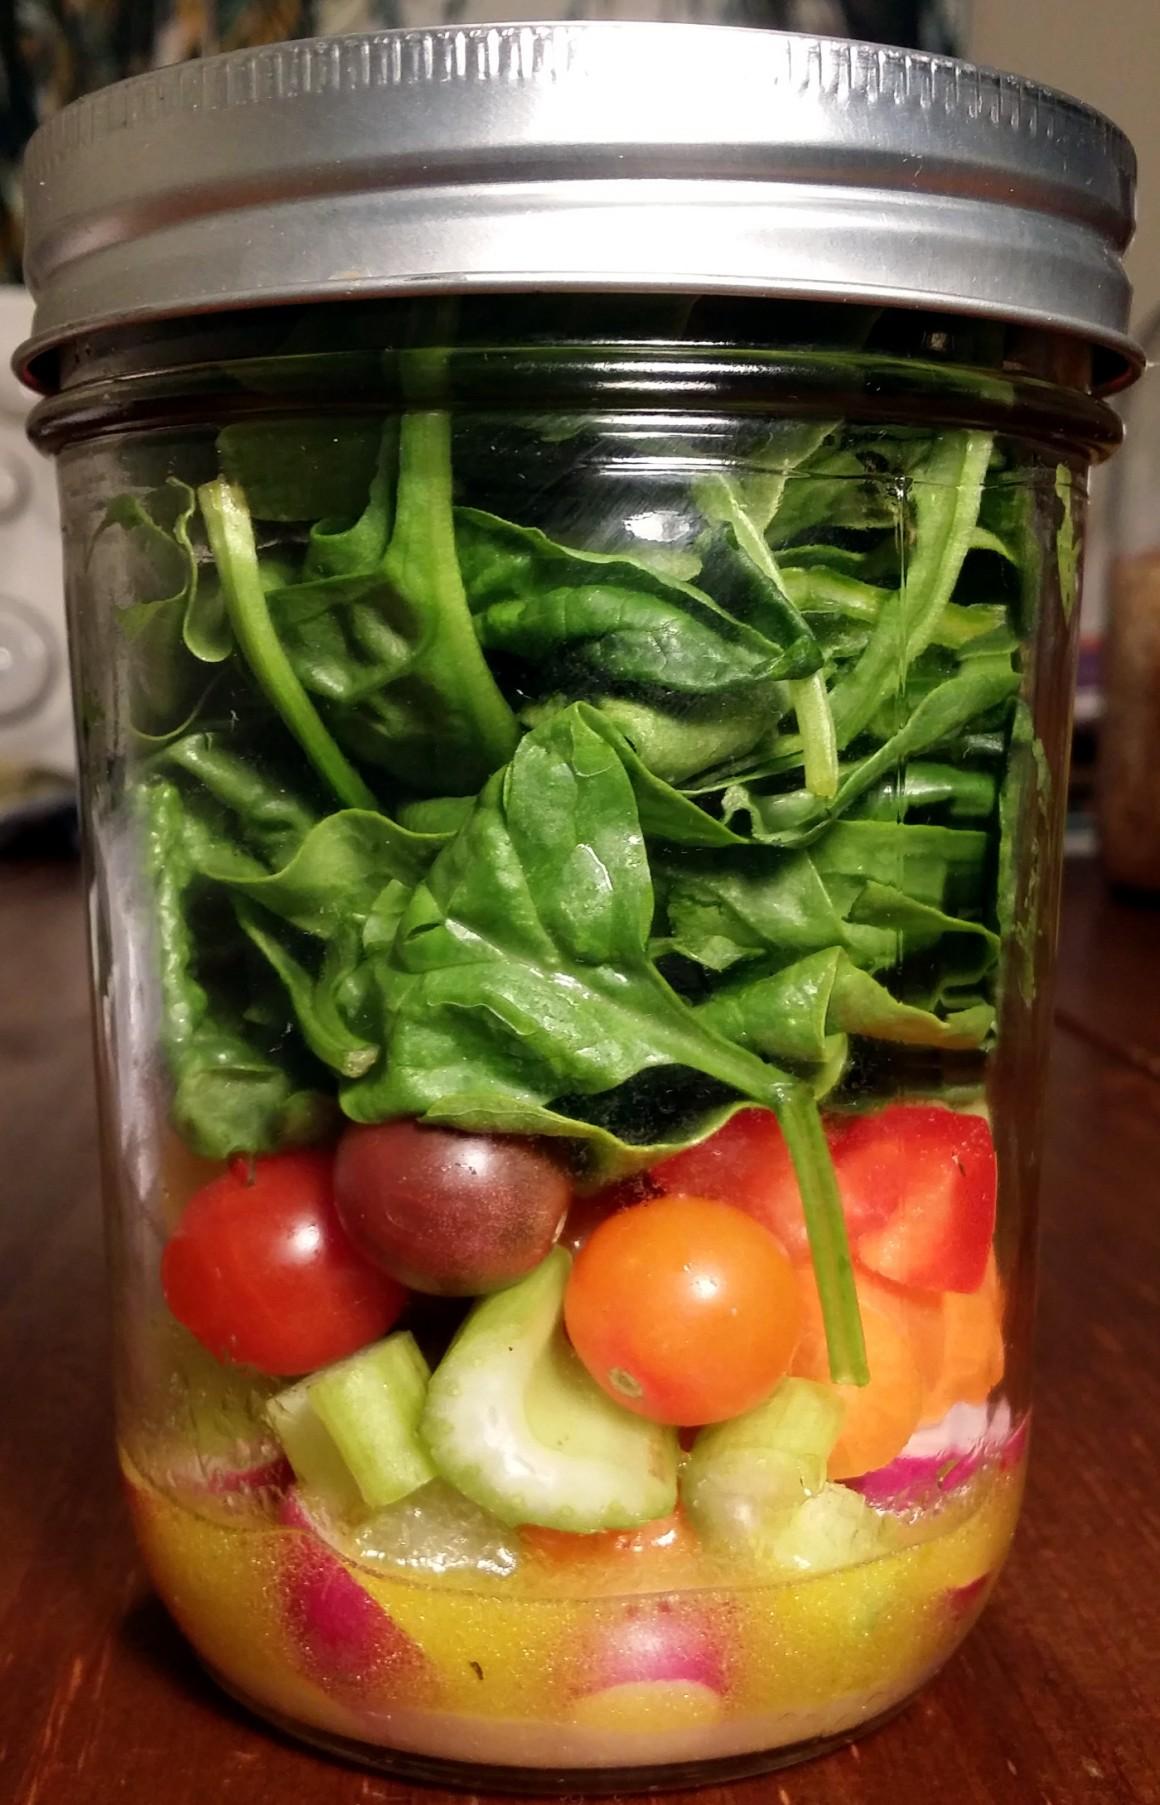 Zero-waste salad to go